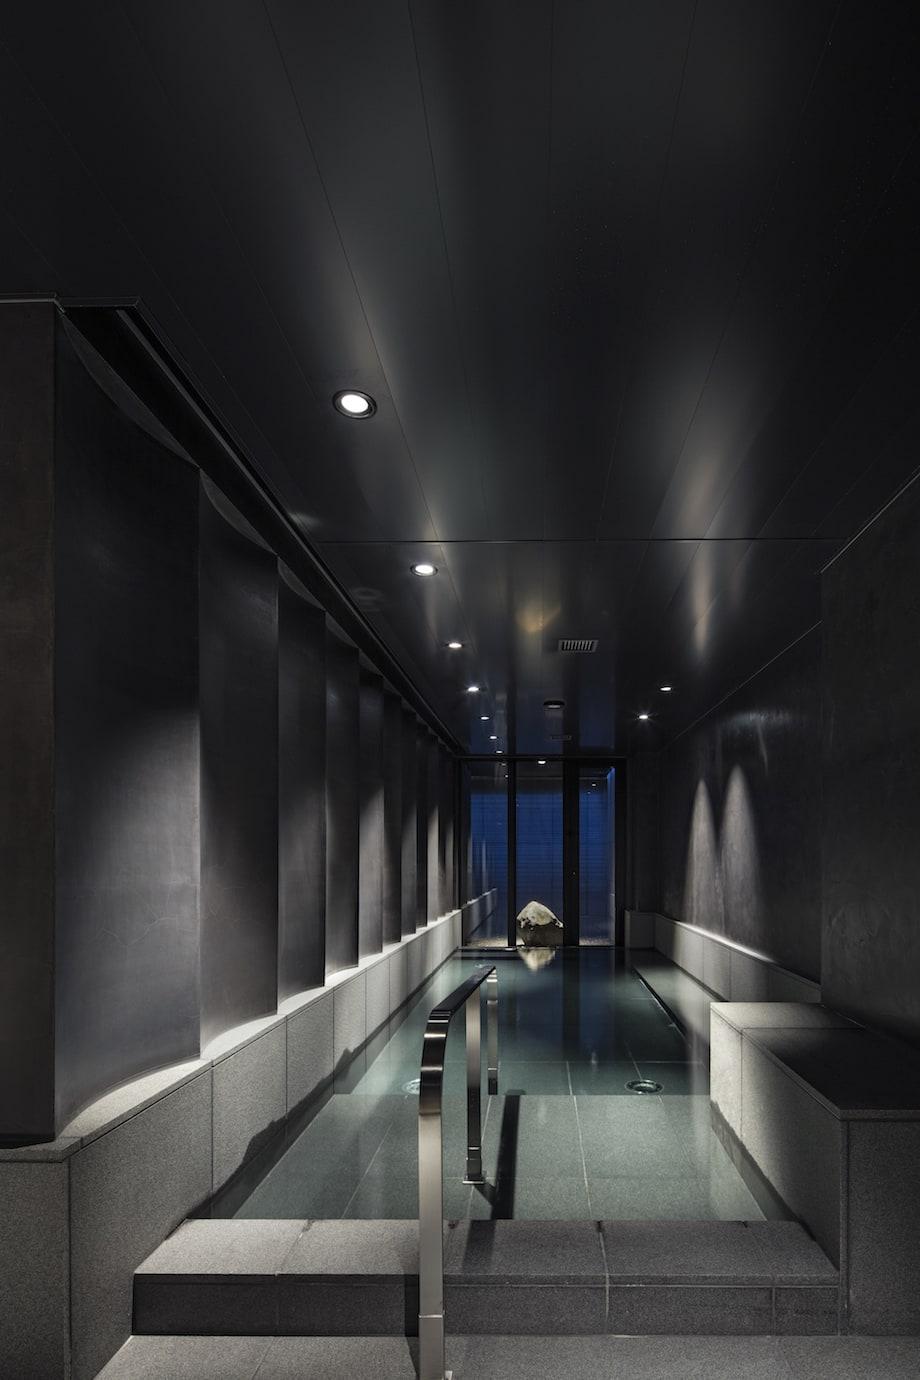 〈hotel tou nishinotoin kyoto by withceed(ホテル トウ 西洞院 京都 バイ ウィズシード)〉大浴場